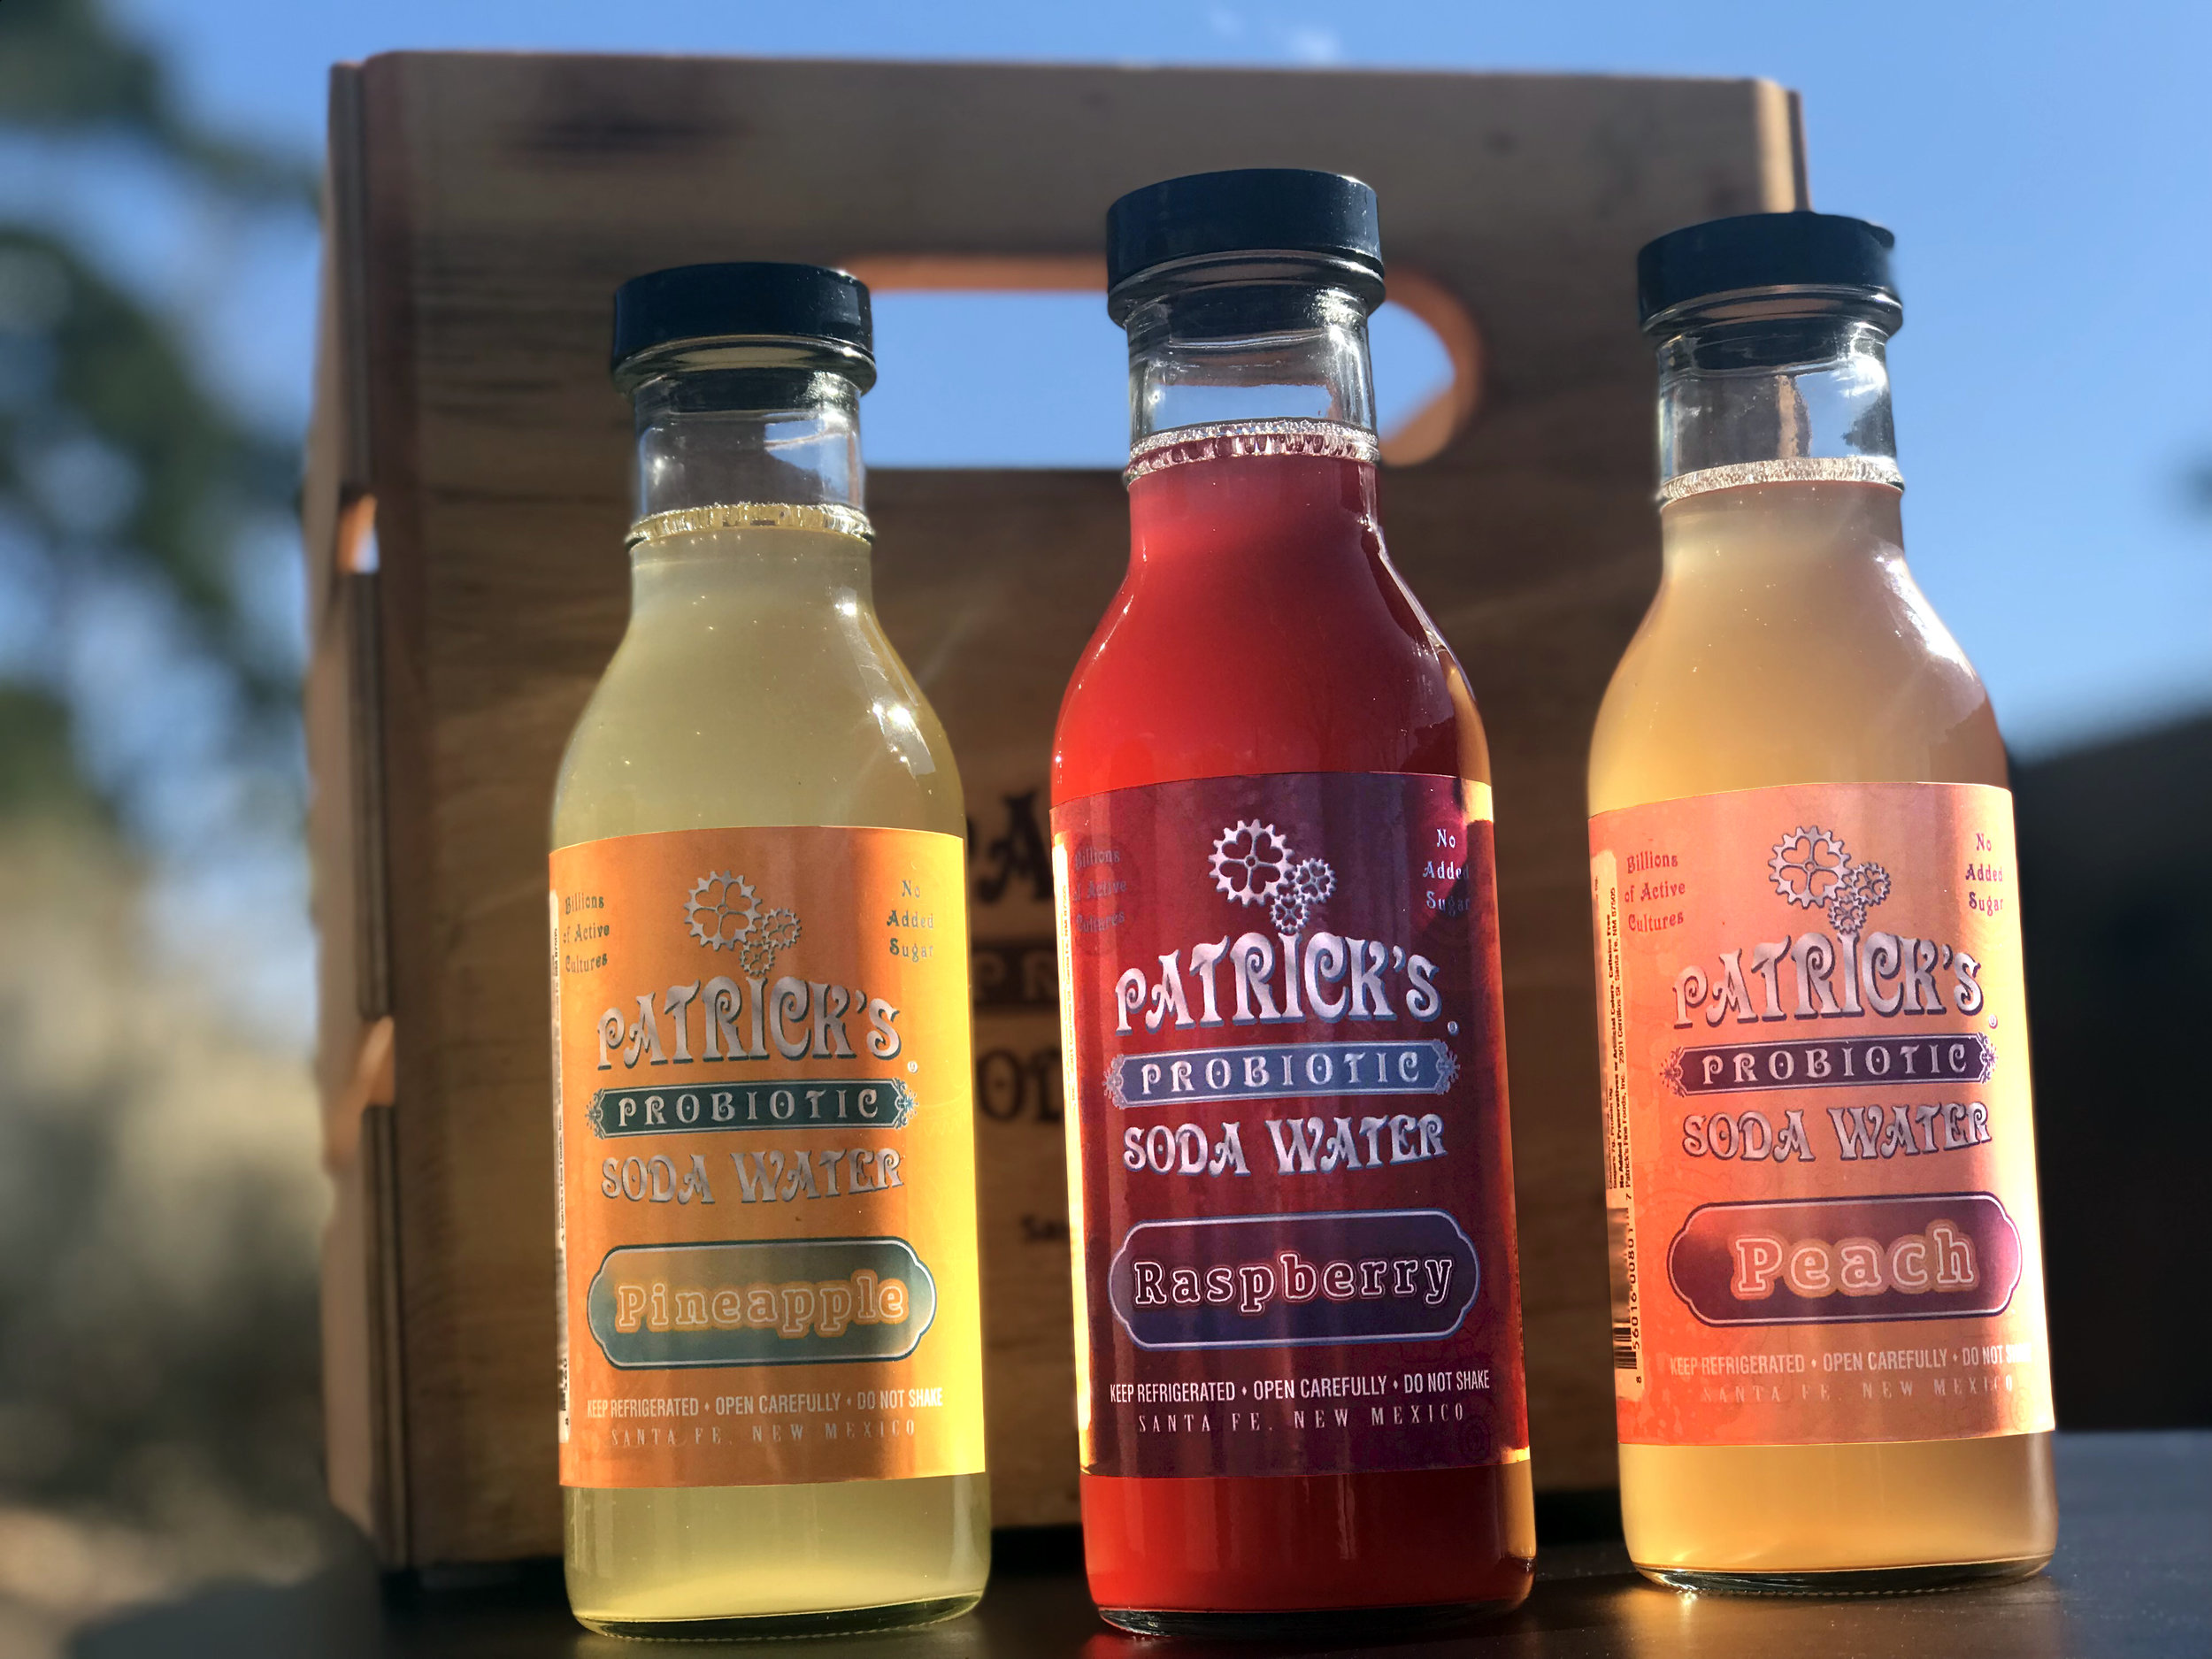 Patrick's Probiotic Soda Waters